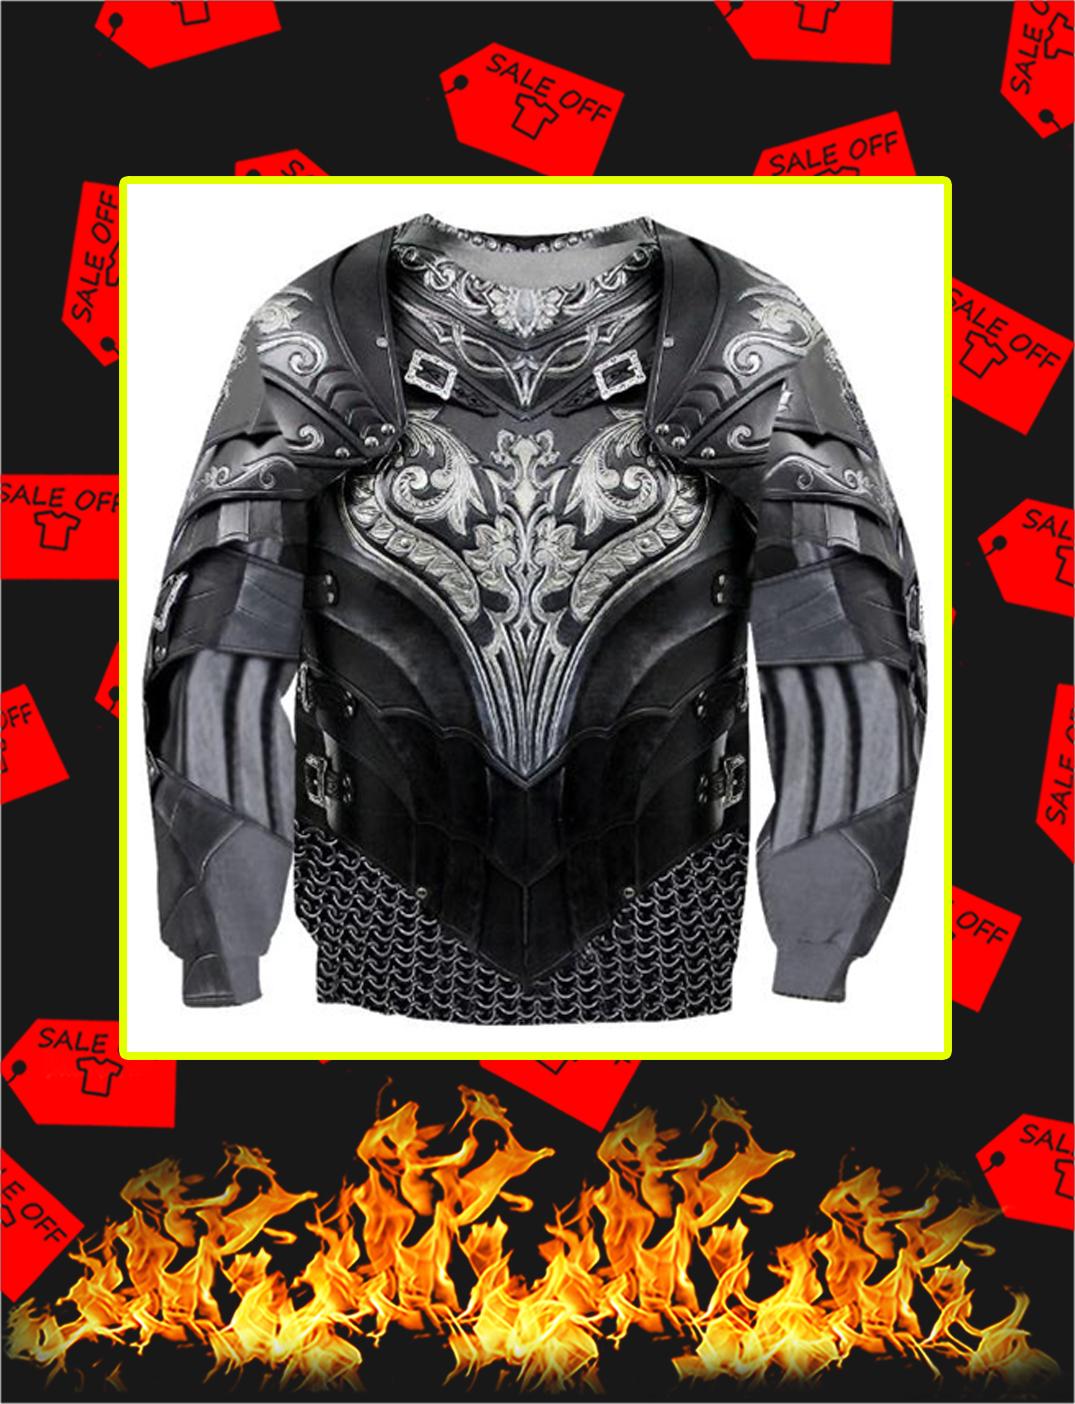 Chainmail Knight Armor 3D Printed Sweatshirt